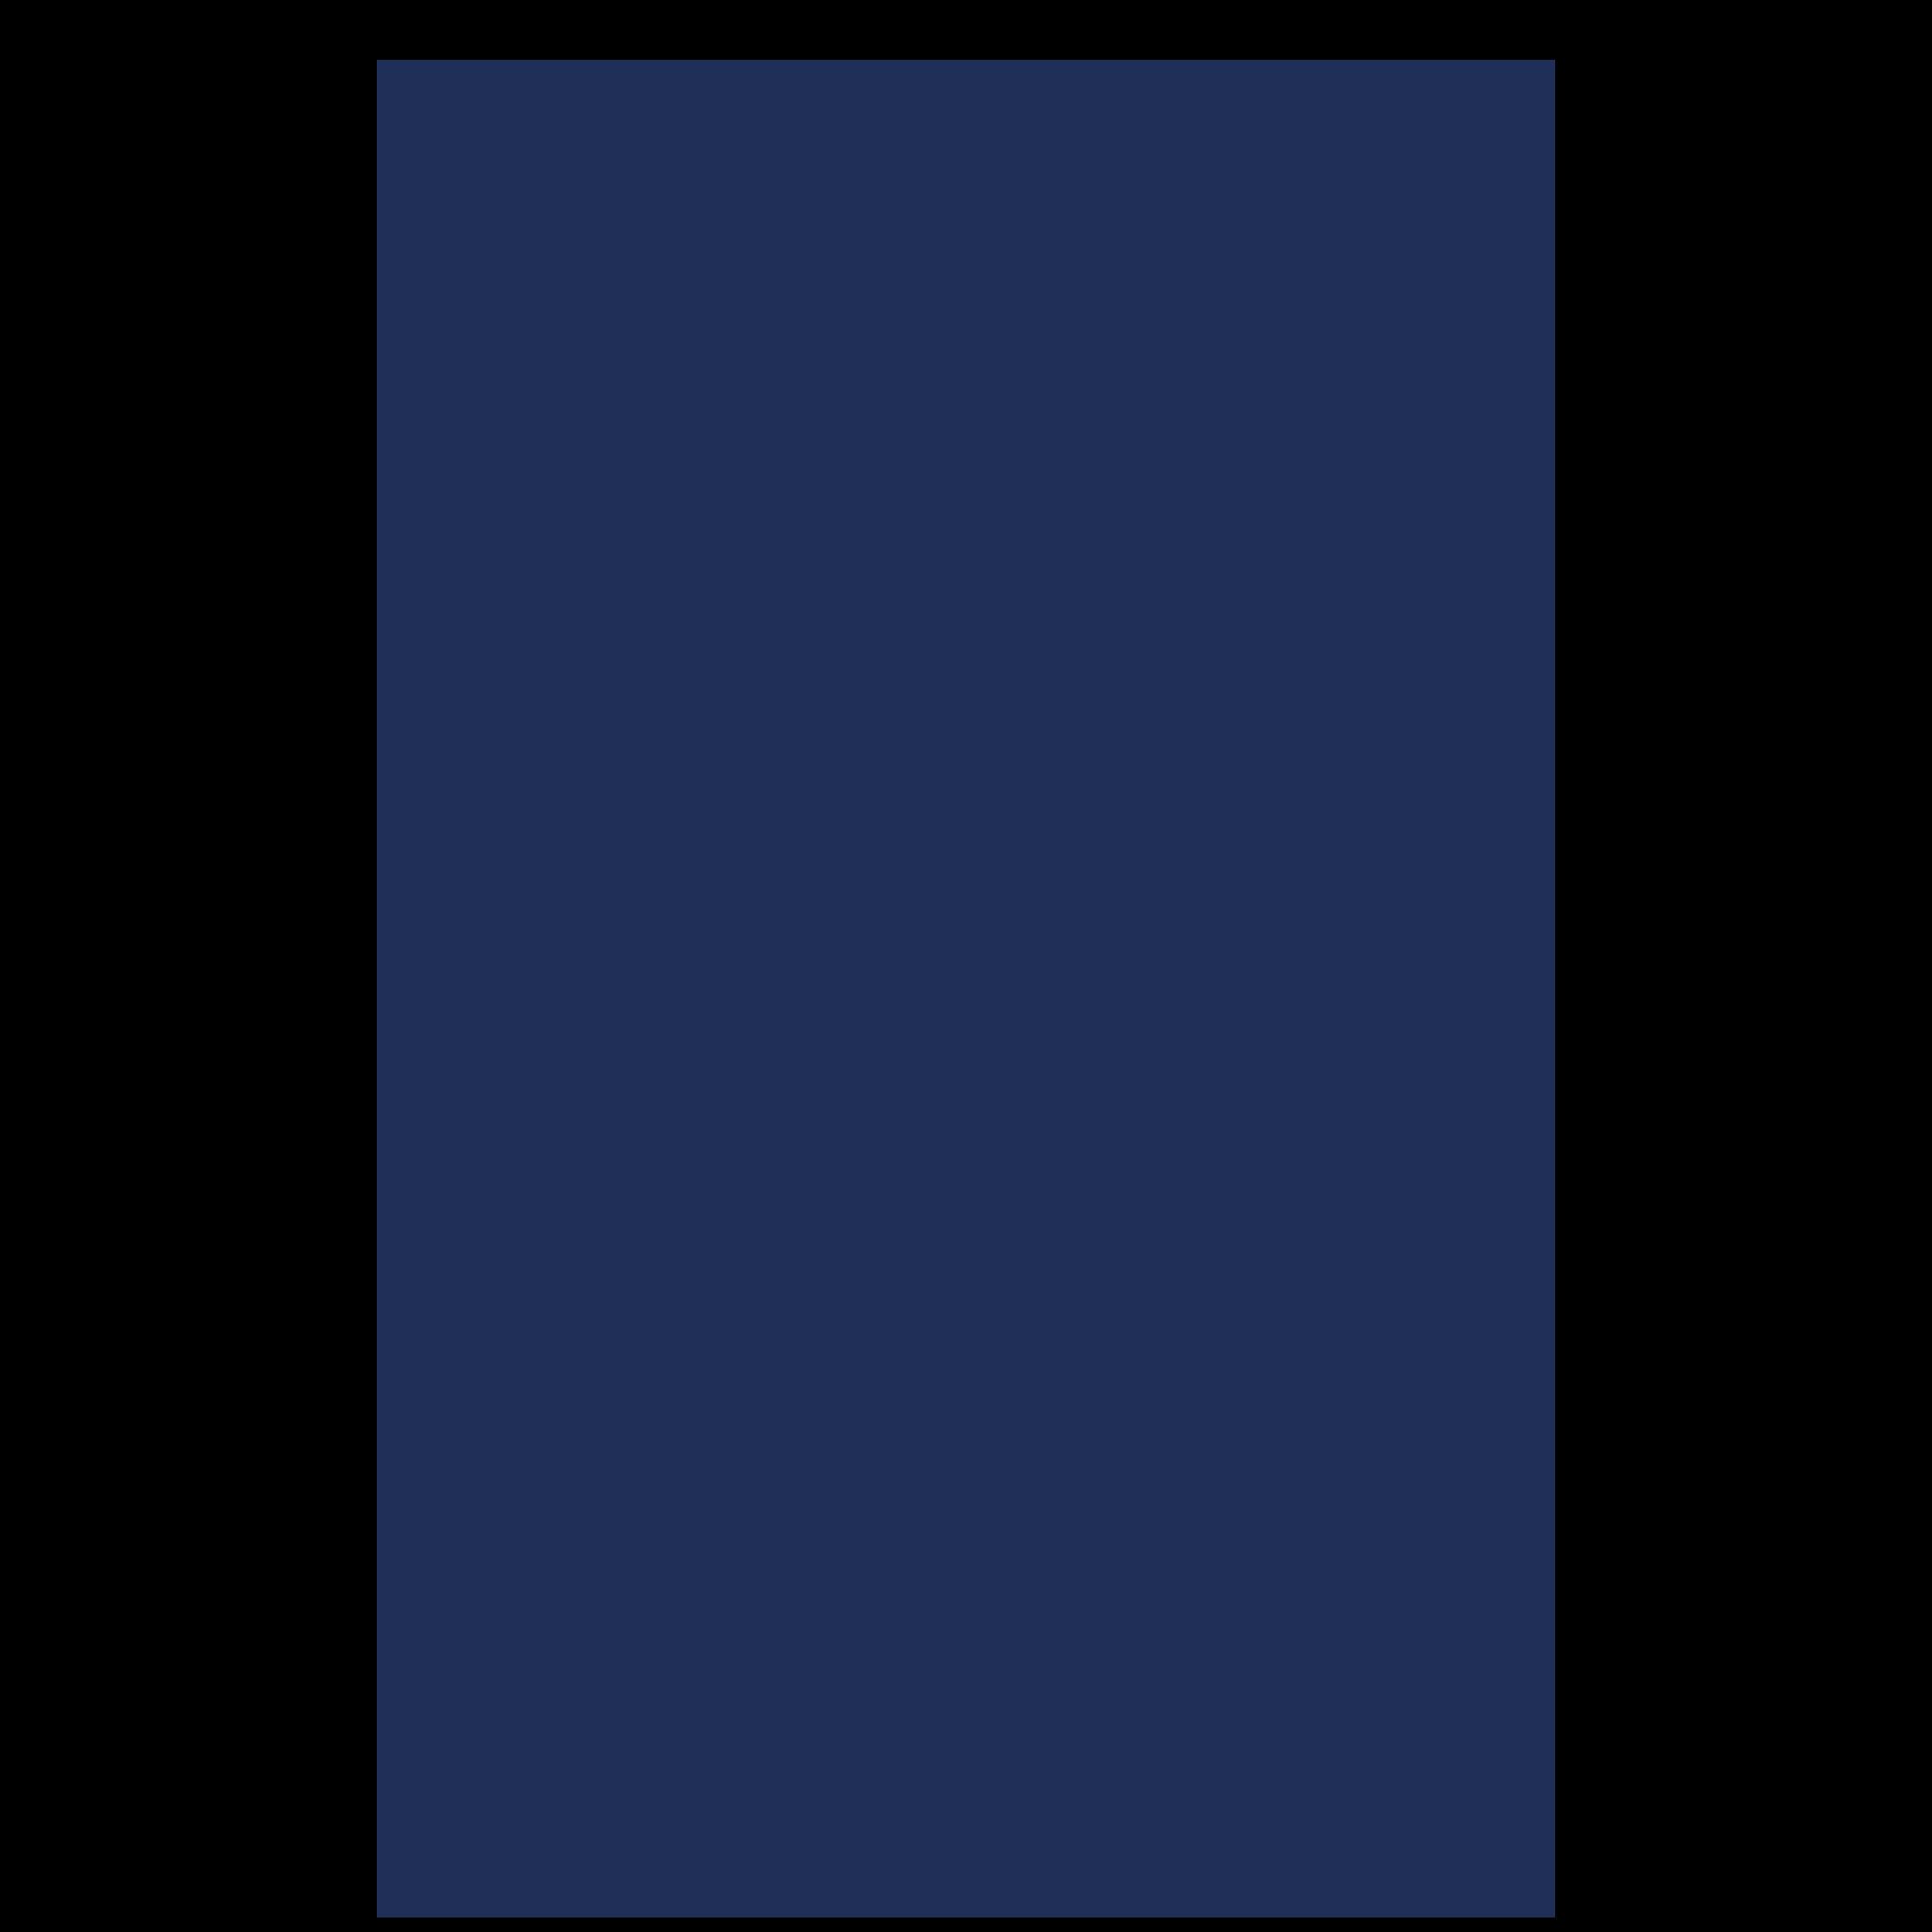 005-businesswoman